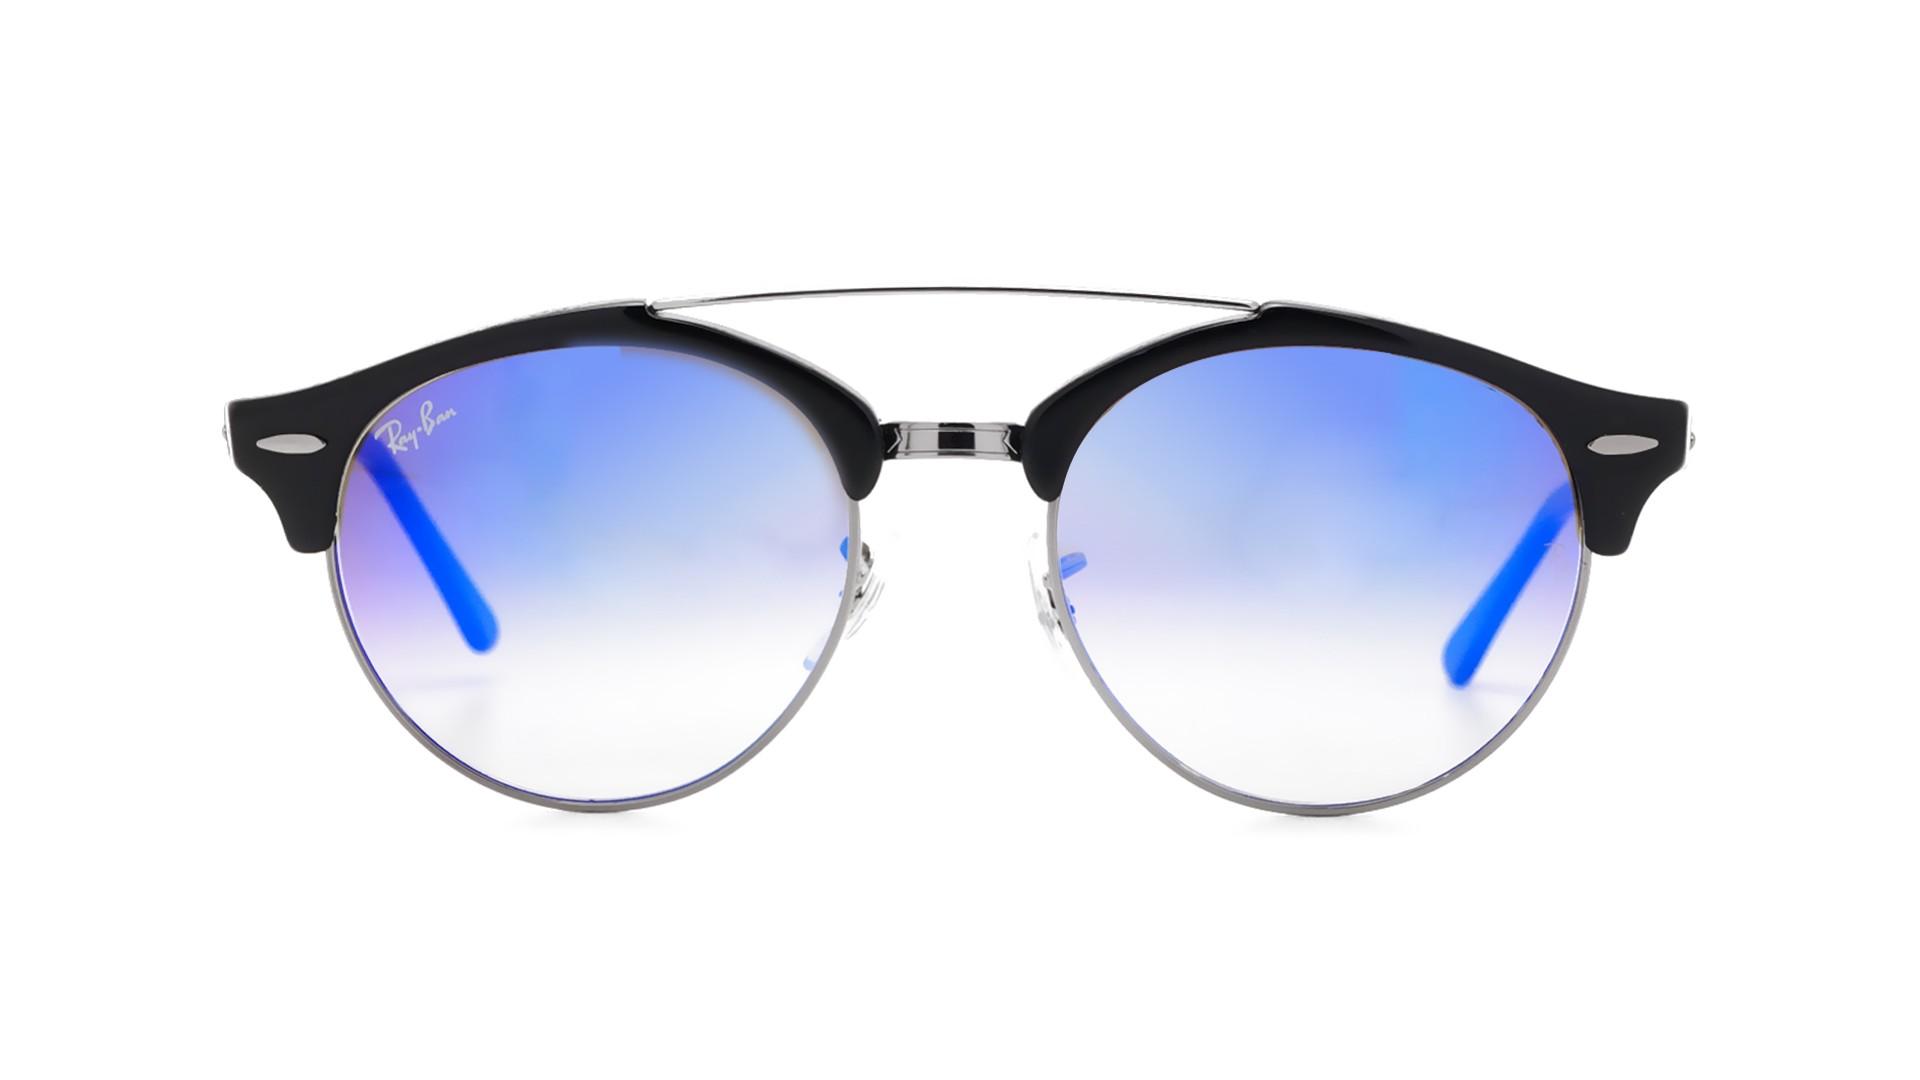 ray ban round double bridge blue sunglassessale. Black Bedroom Furniture Sets. Home Design Ideas